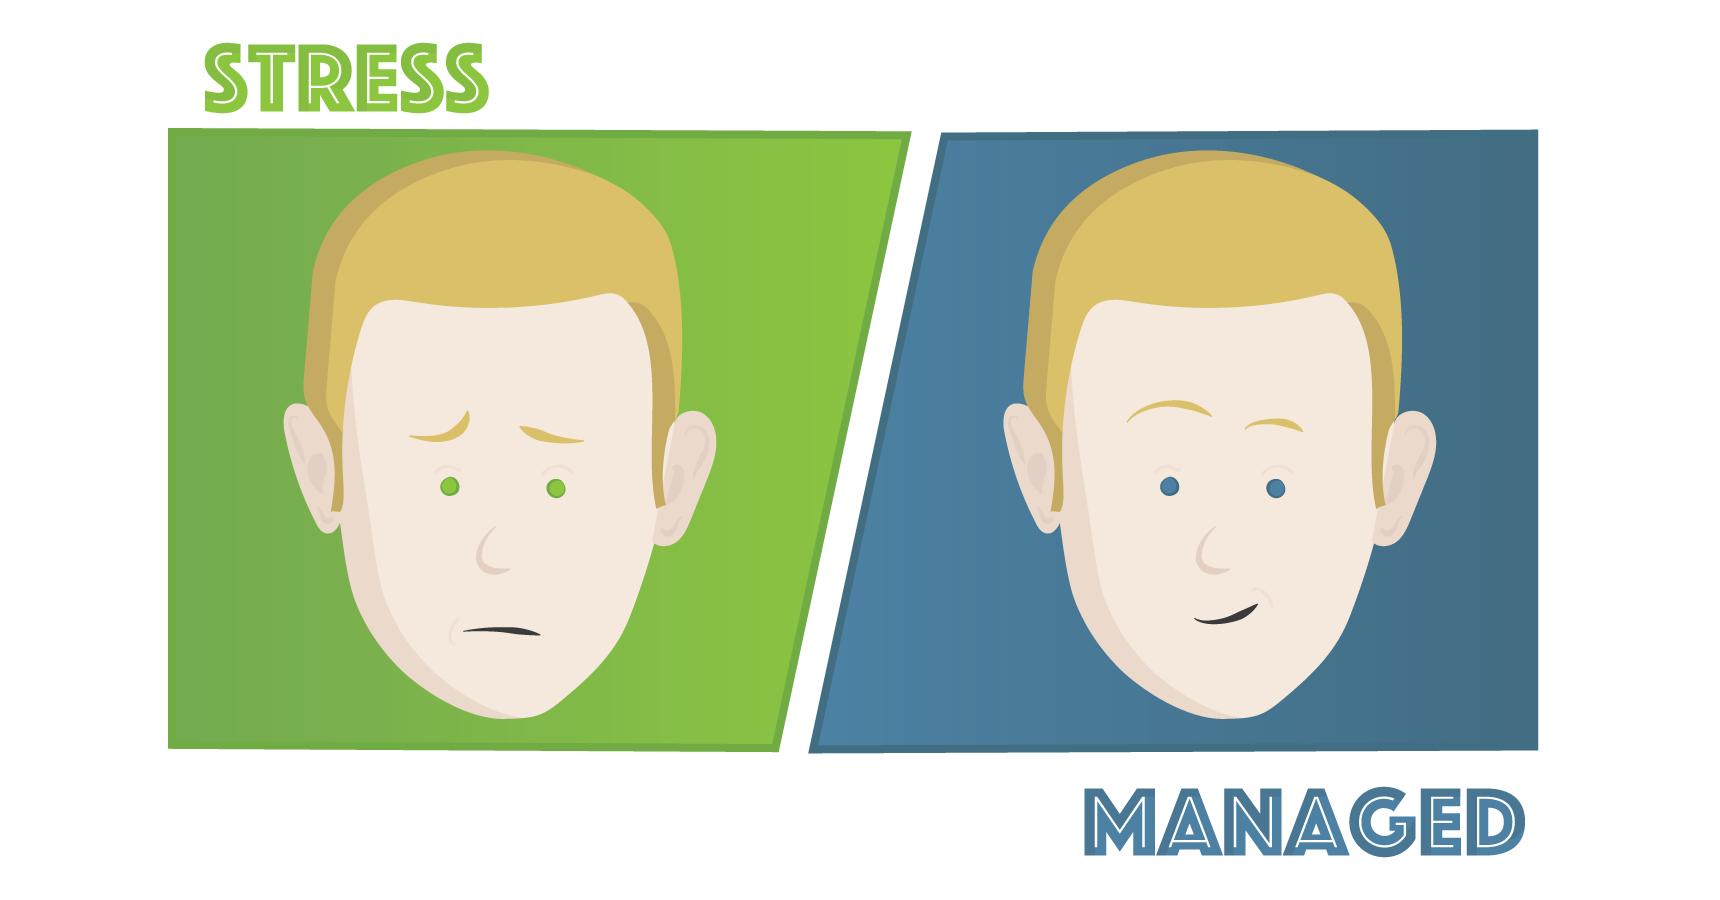 Stress Management Strategies, Symptoms, & Tips (A TUTORIAL)